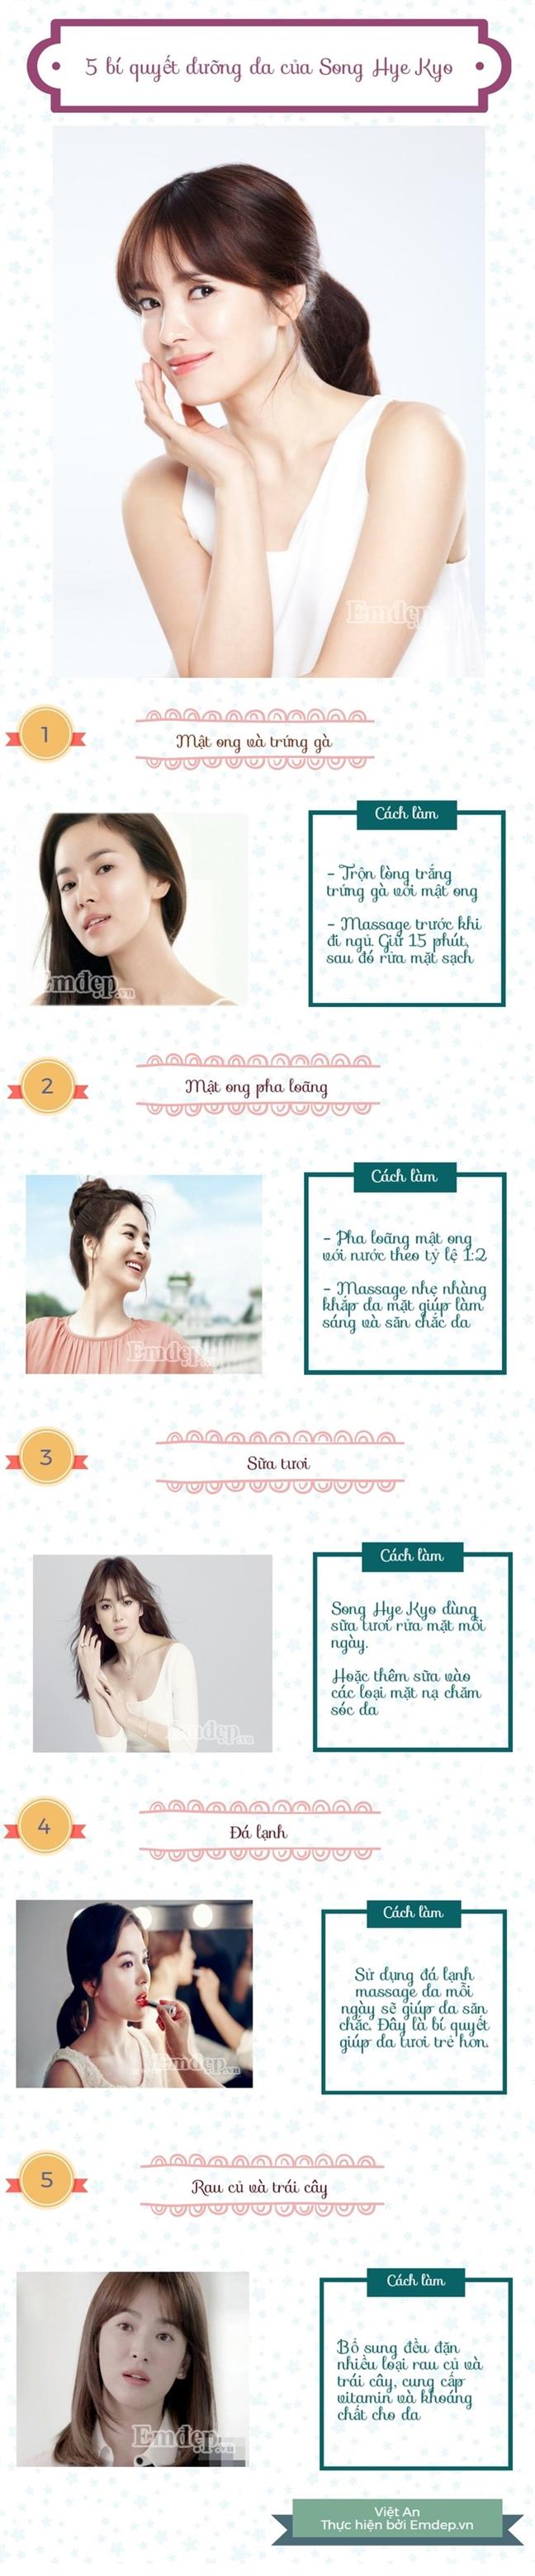 Tai sao da Song Hye Kyo luon trang min, khong ty vet?